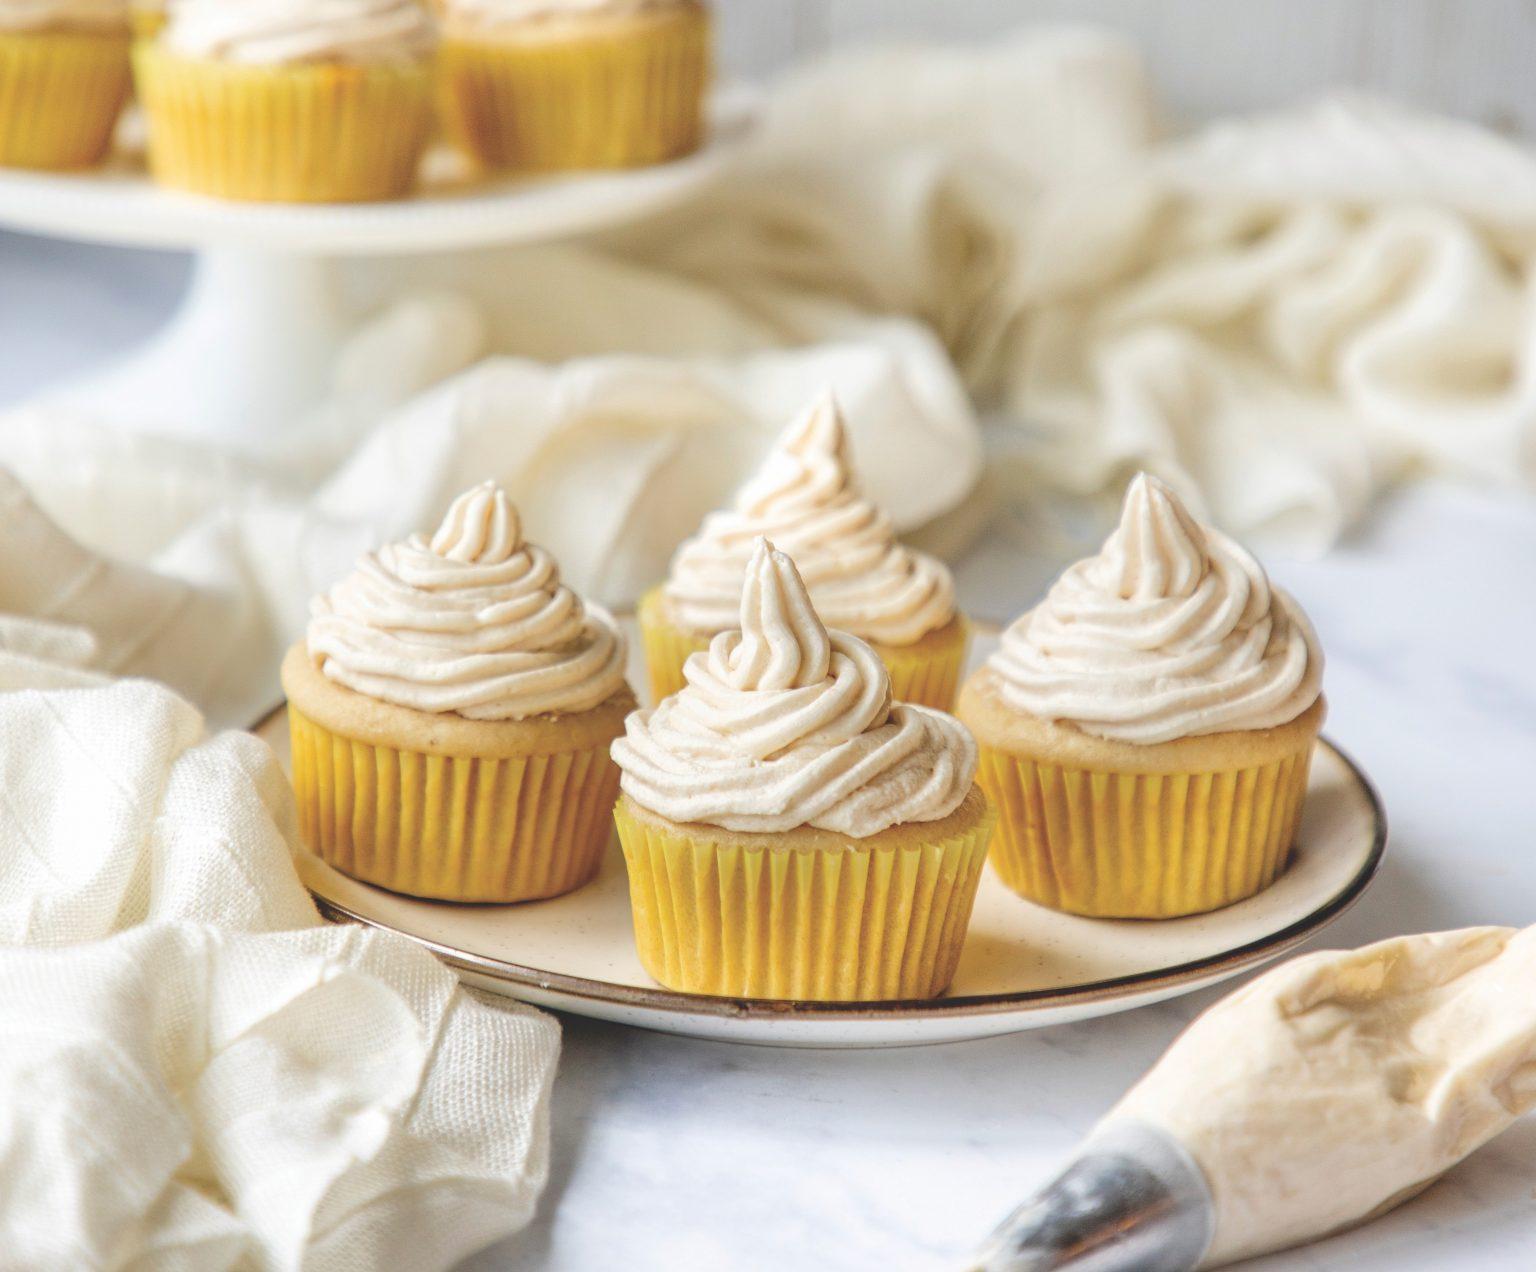 Vegan Vanilla Cupcakes with Buttercream